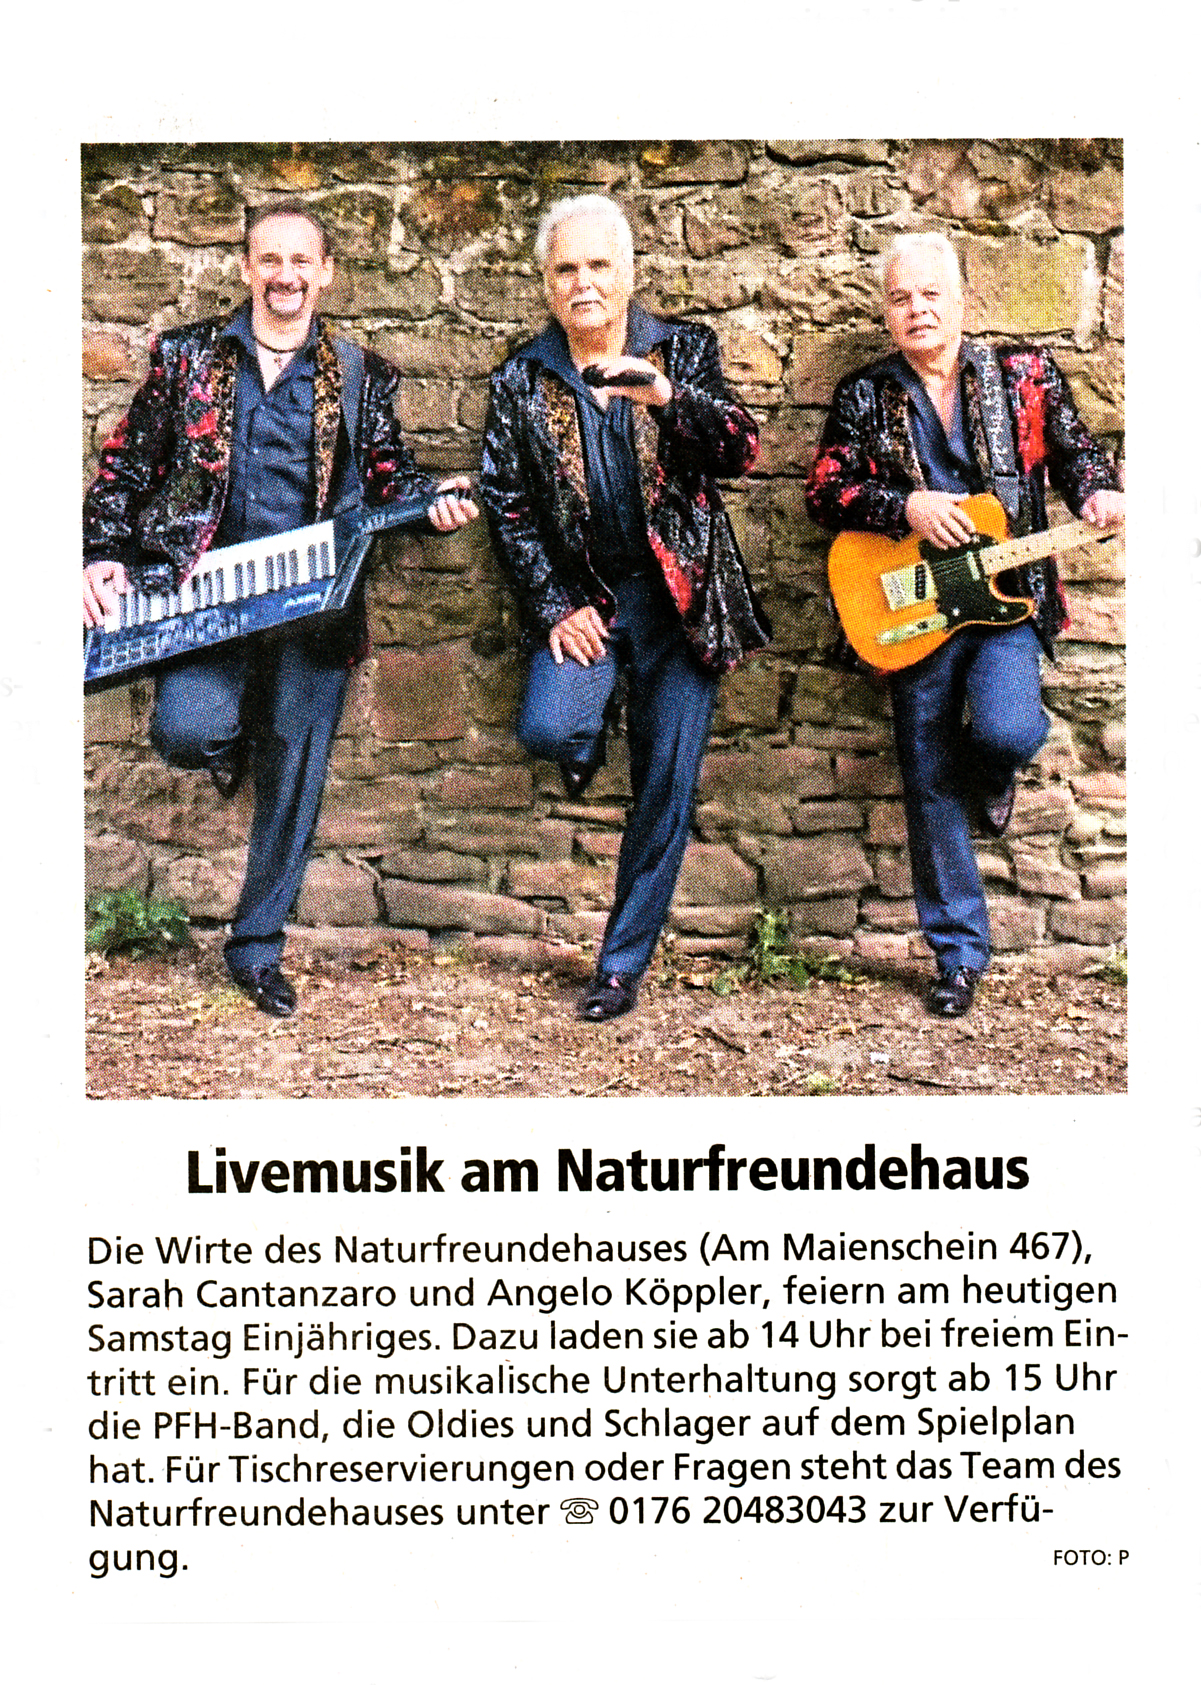 Offenbach Post, 18. Juli 2020